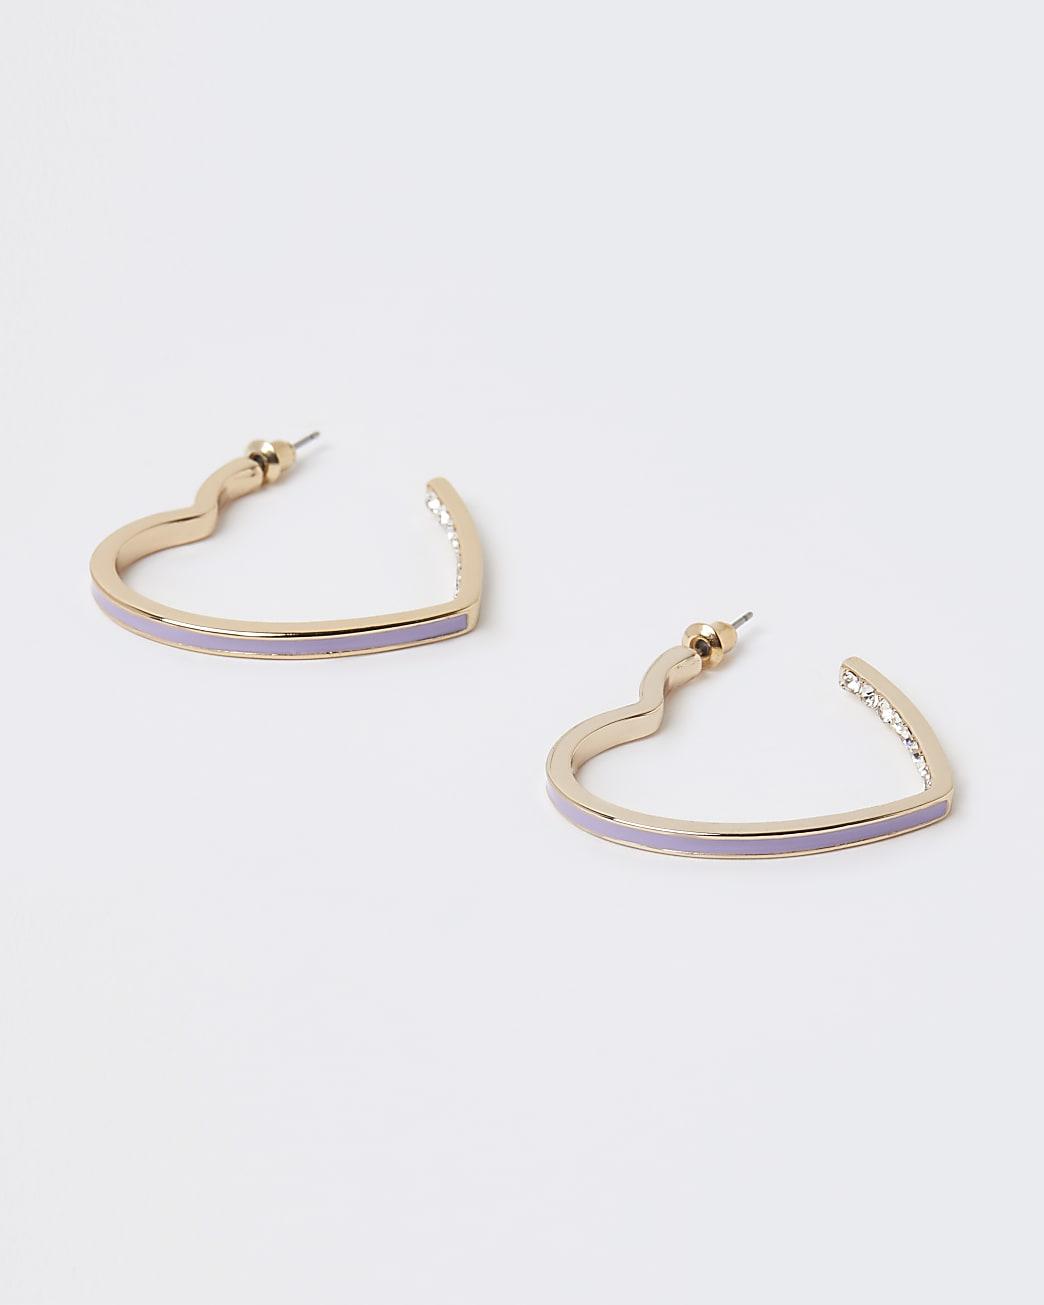 Gold enameled heart hoop earrings